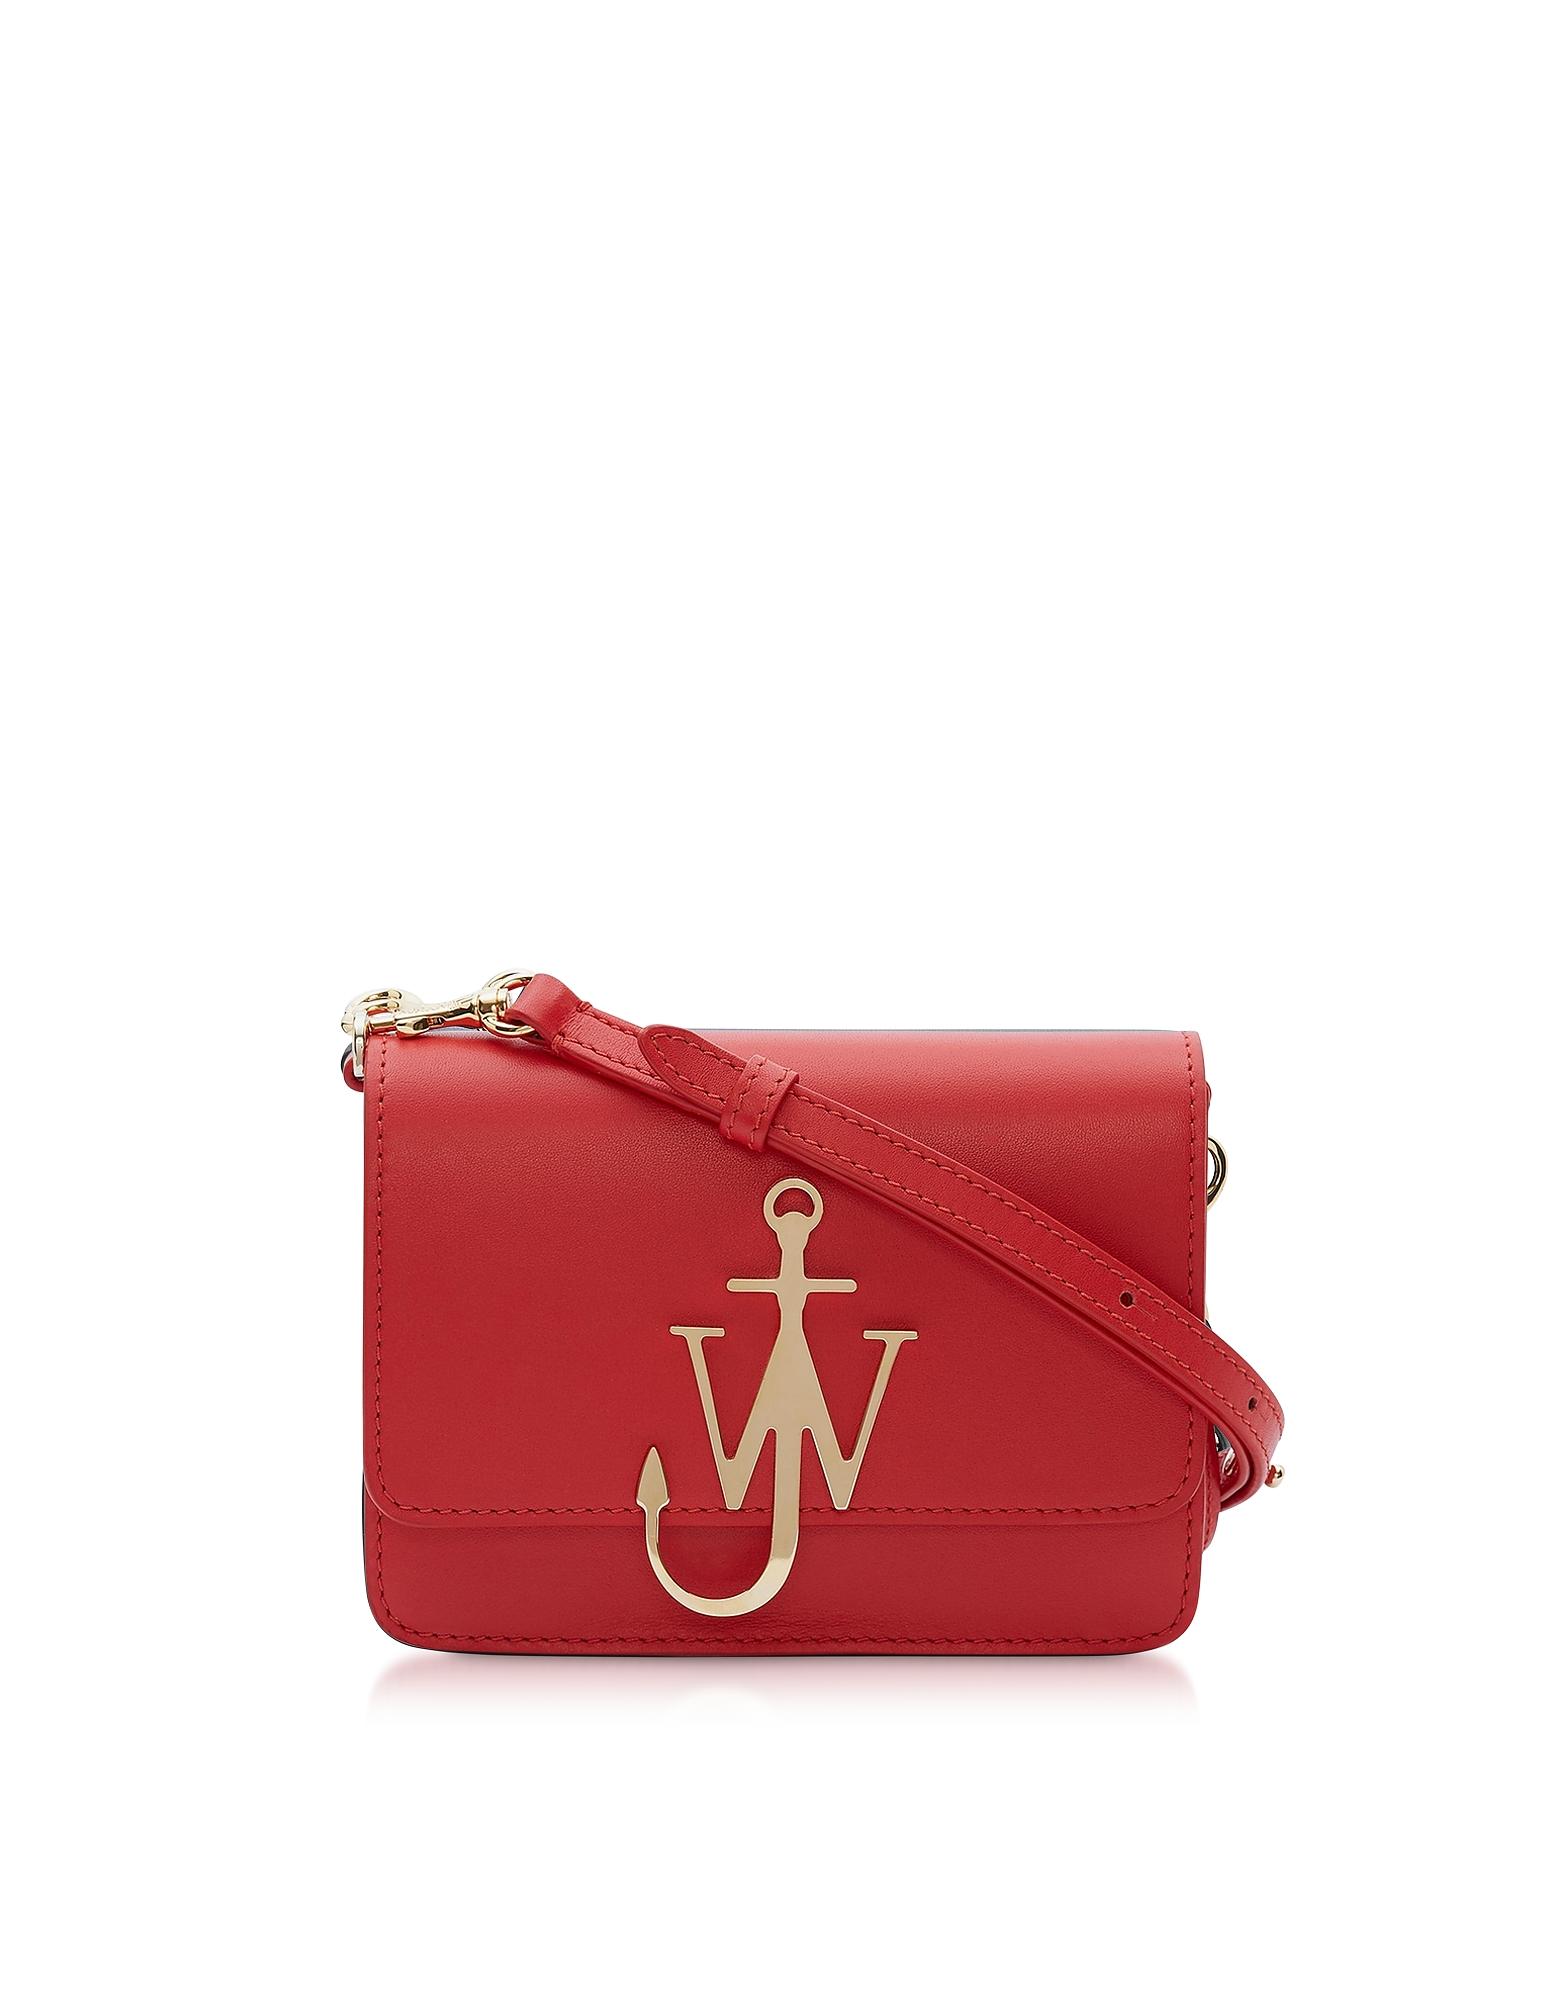 New Mini Logo Purse W/Shoulder Strap in Scarlet